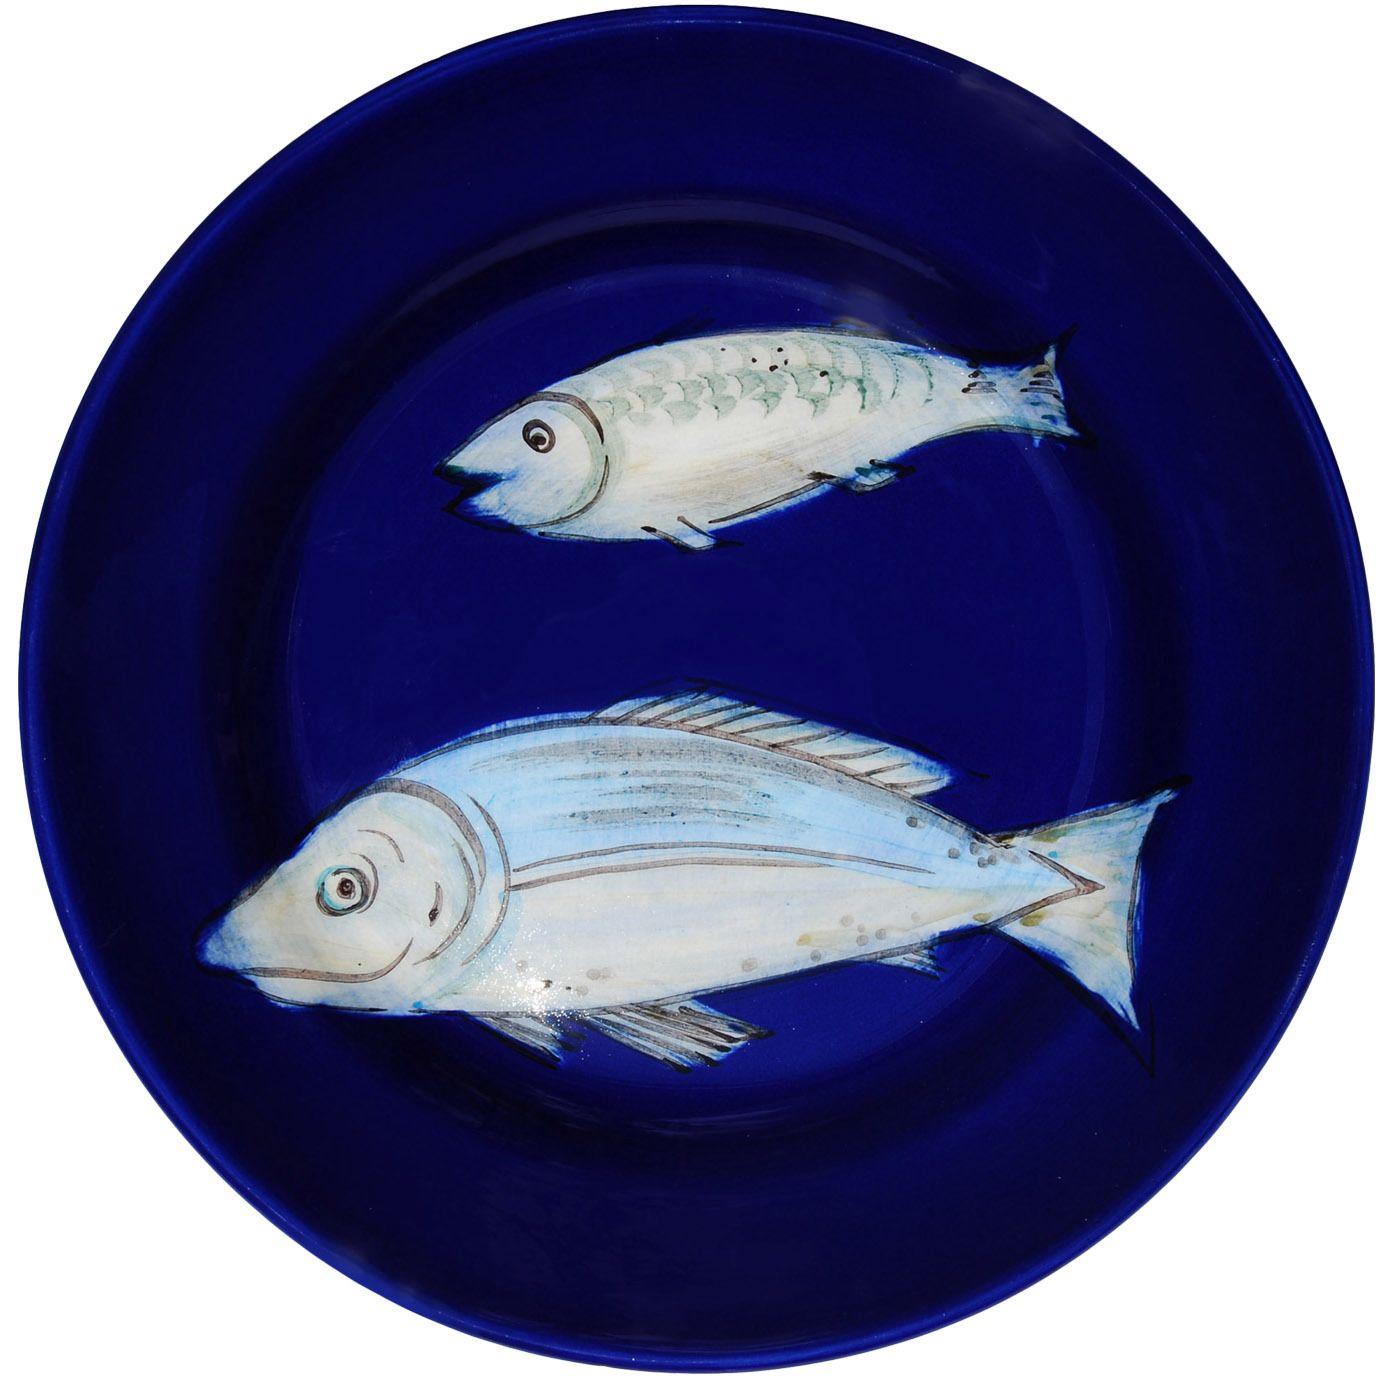 Set of 6 Blue Fish Dessert Plates - Shop timeless tableware handmade in Italy…